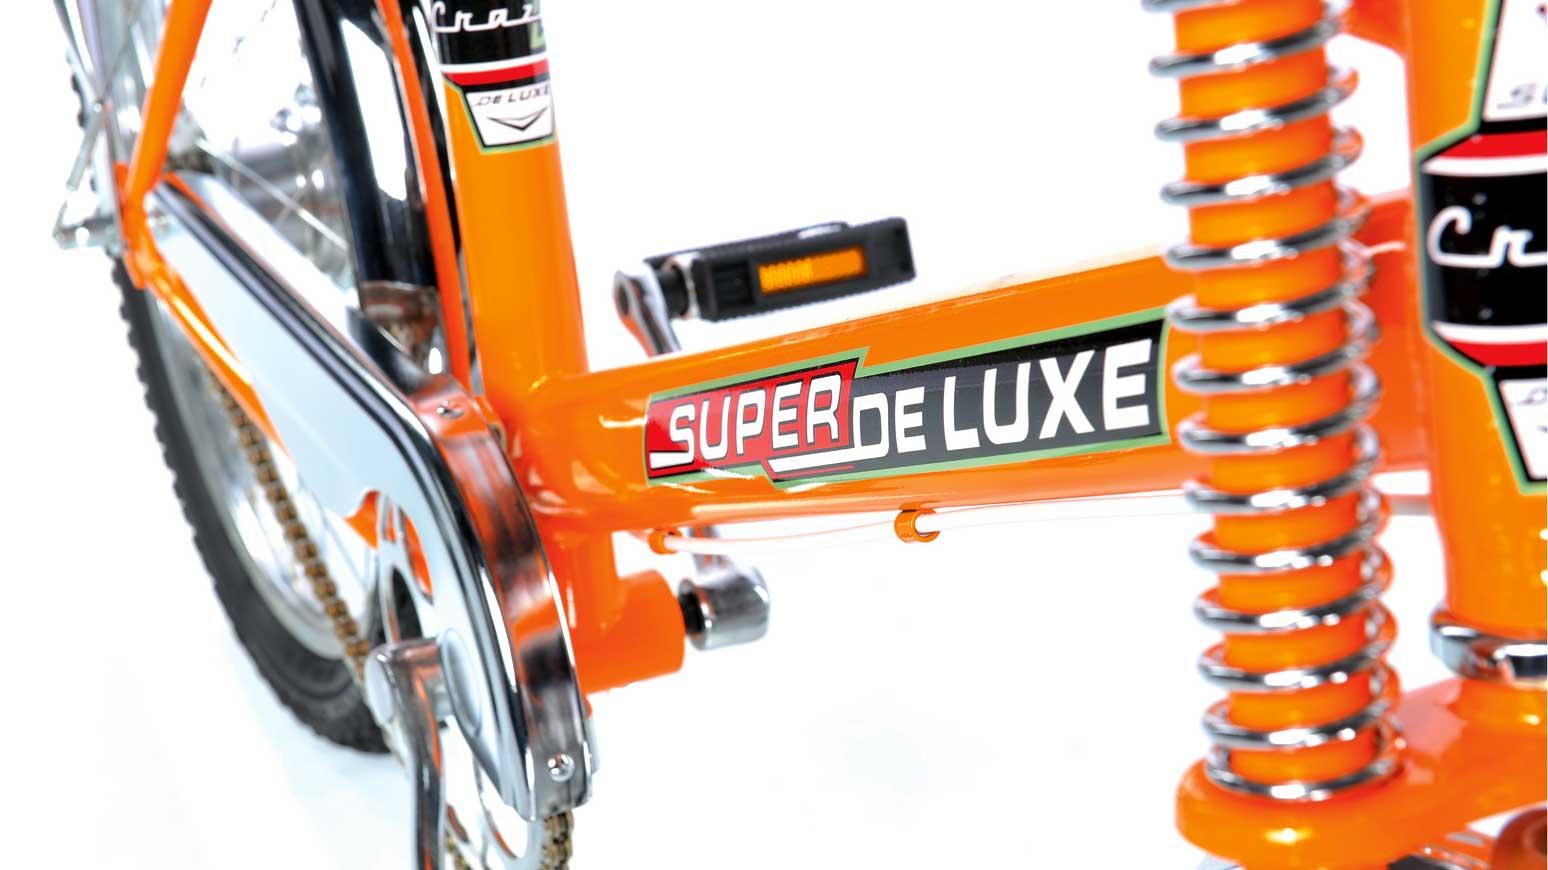 Bonanzarad Crazy D. Superdeluxe-Logo